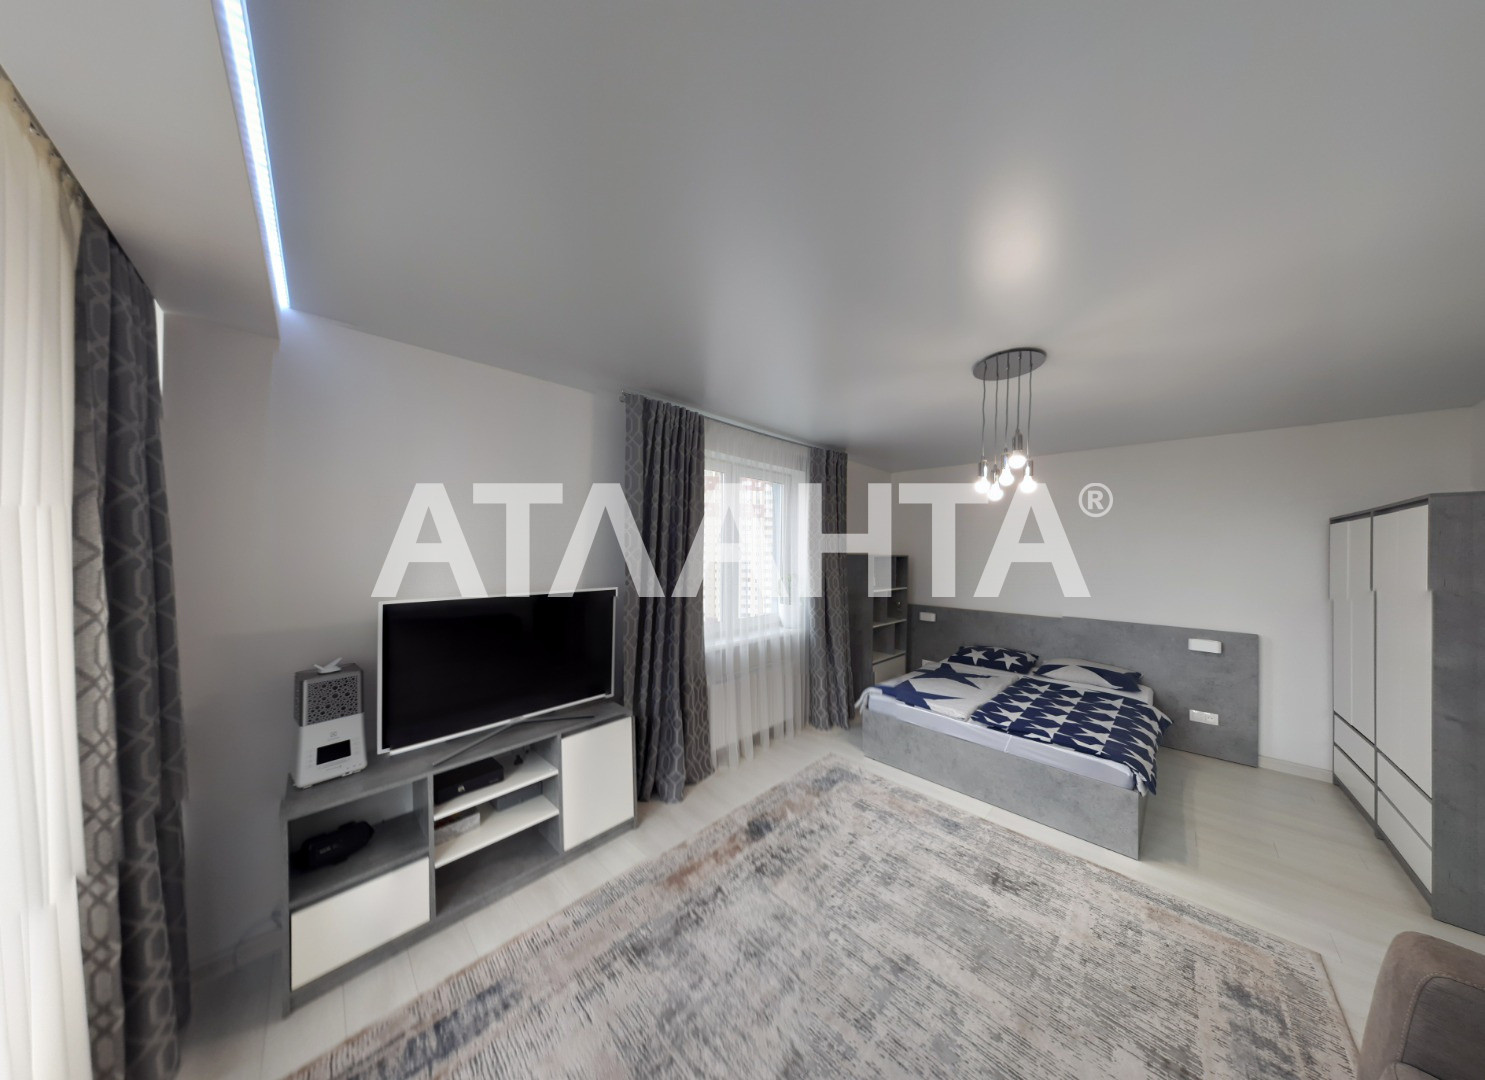 Продается 3-комнатная Квартира на ул. Просп. Глушкова — 160 000 у.е. (фото №10)